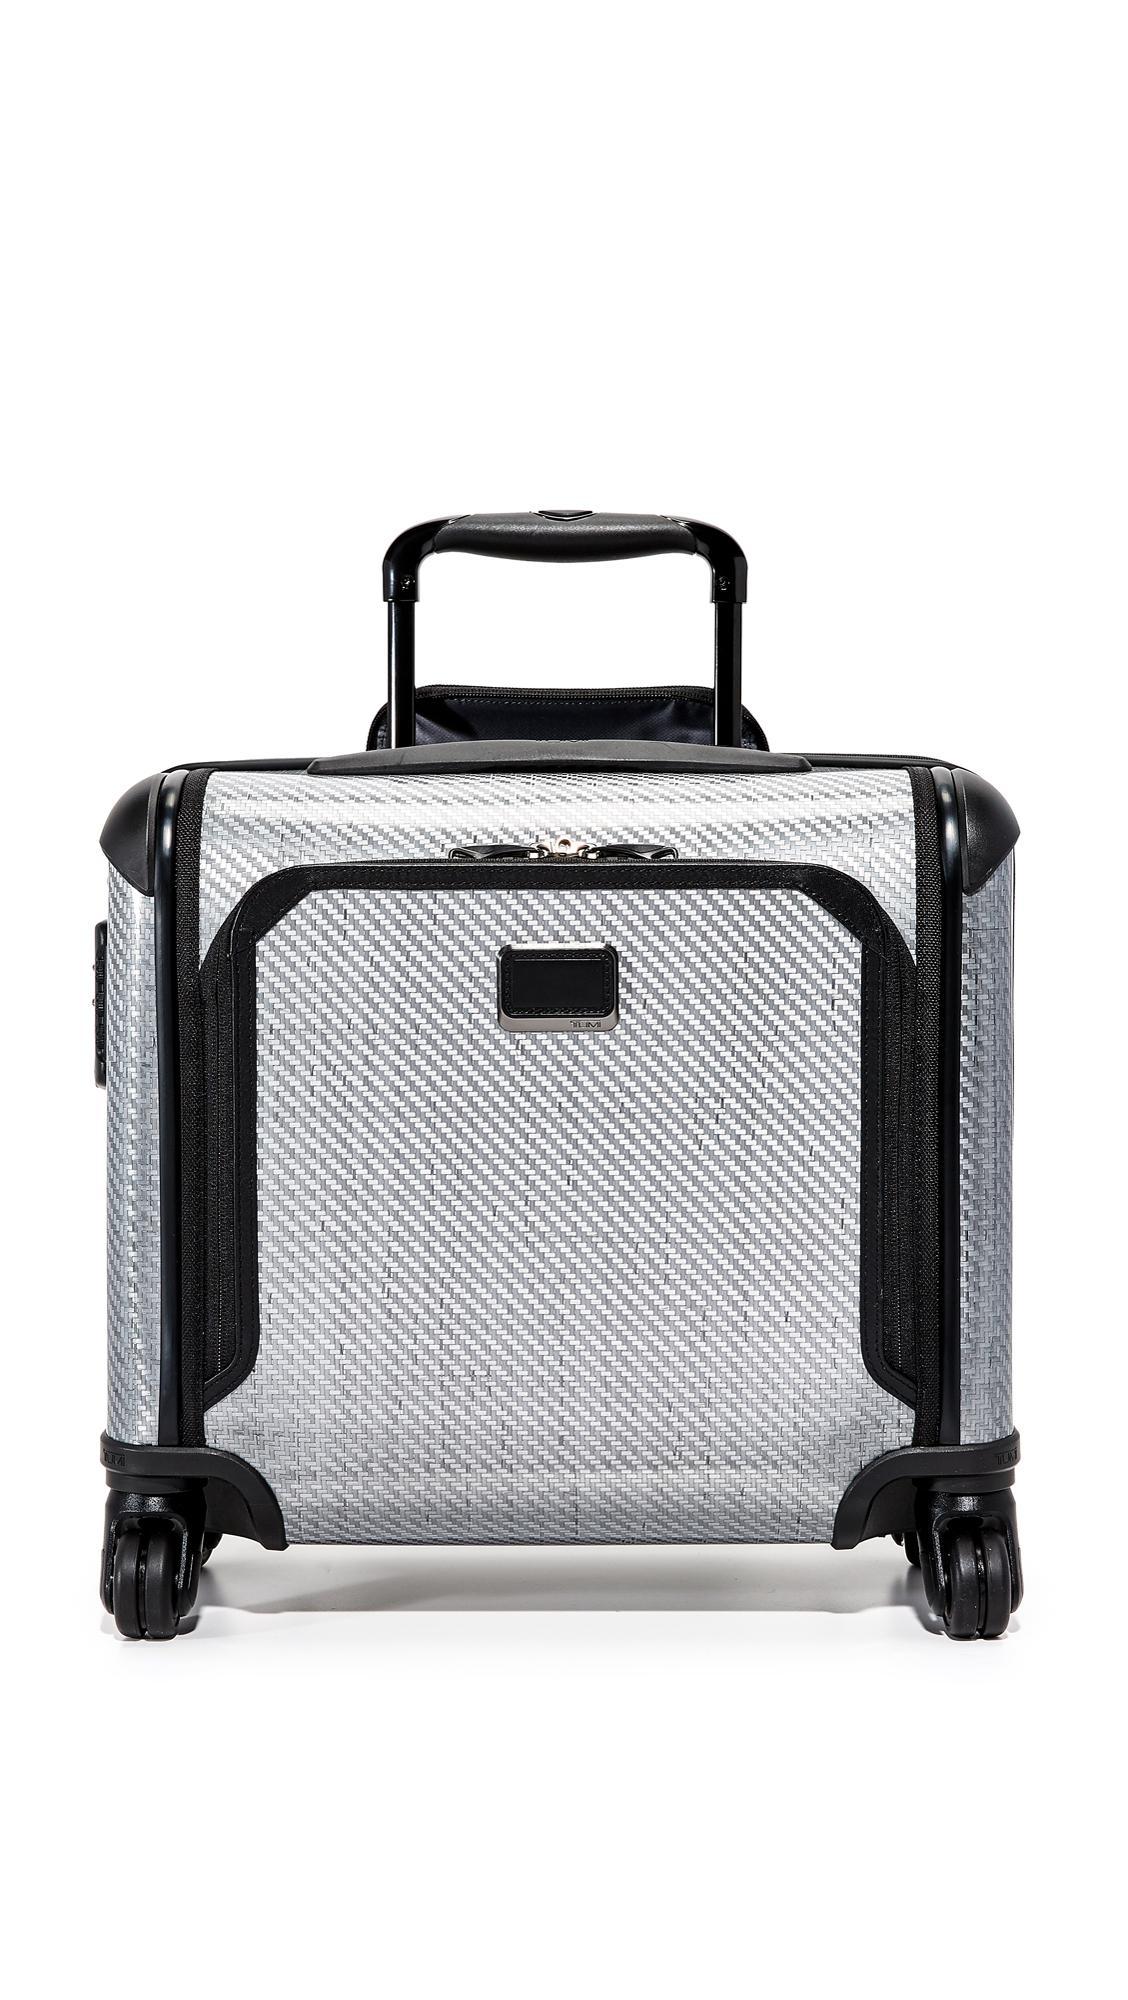 Tumi Tegra Lite Max Carry On Suitcase In T-graphite